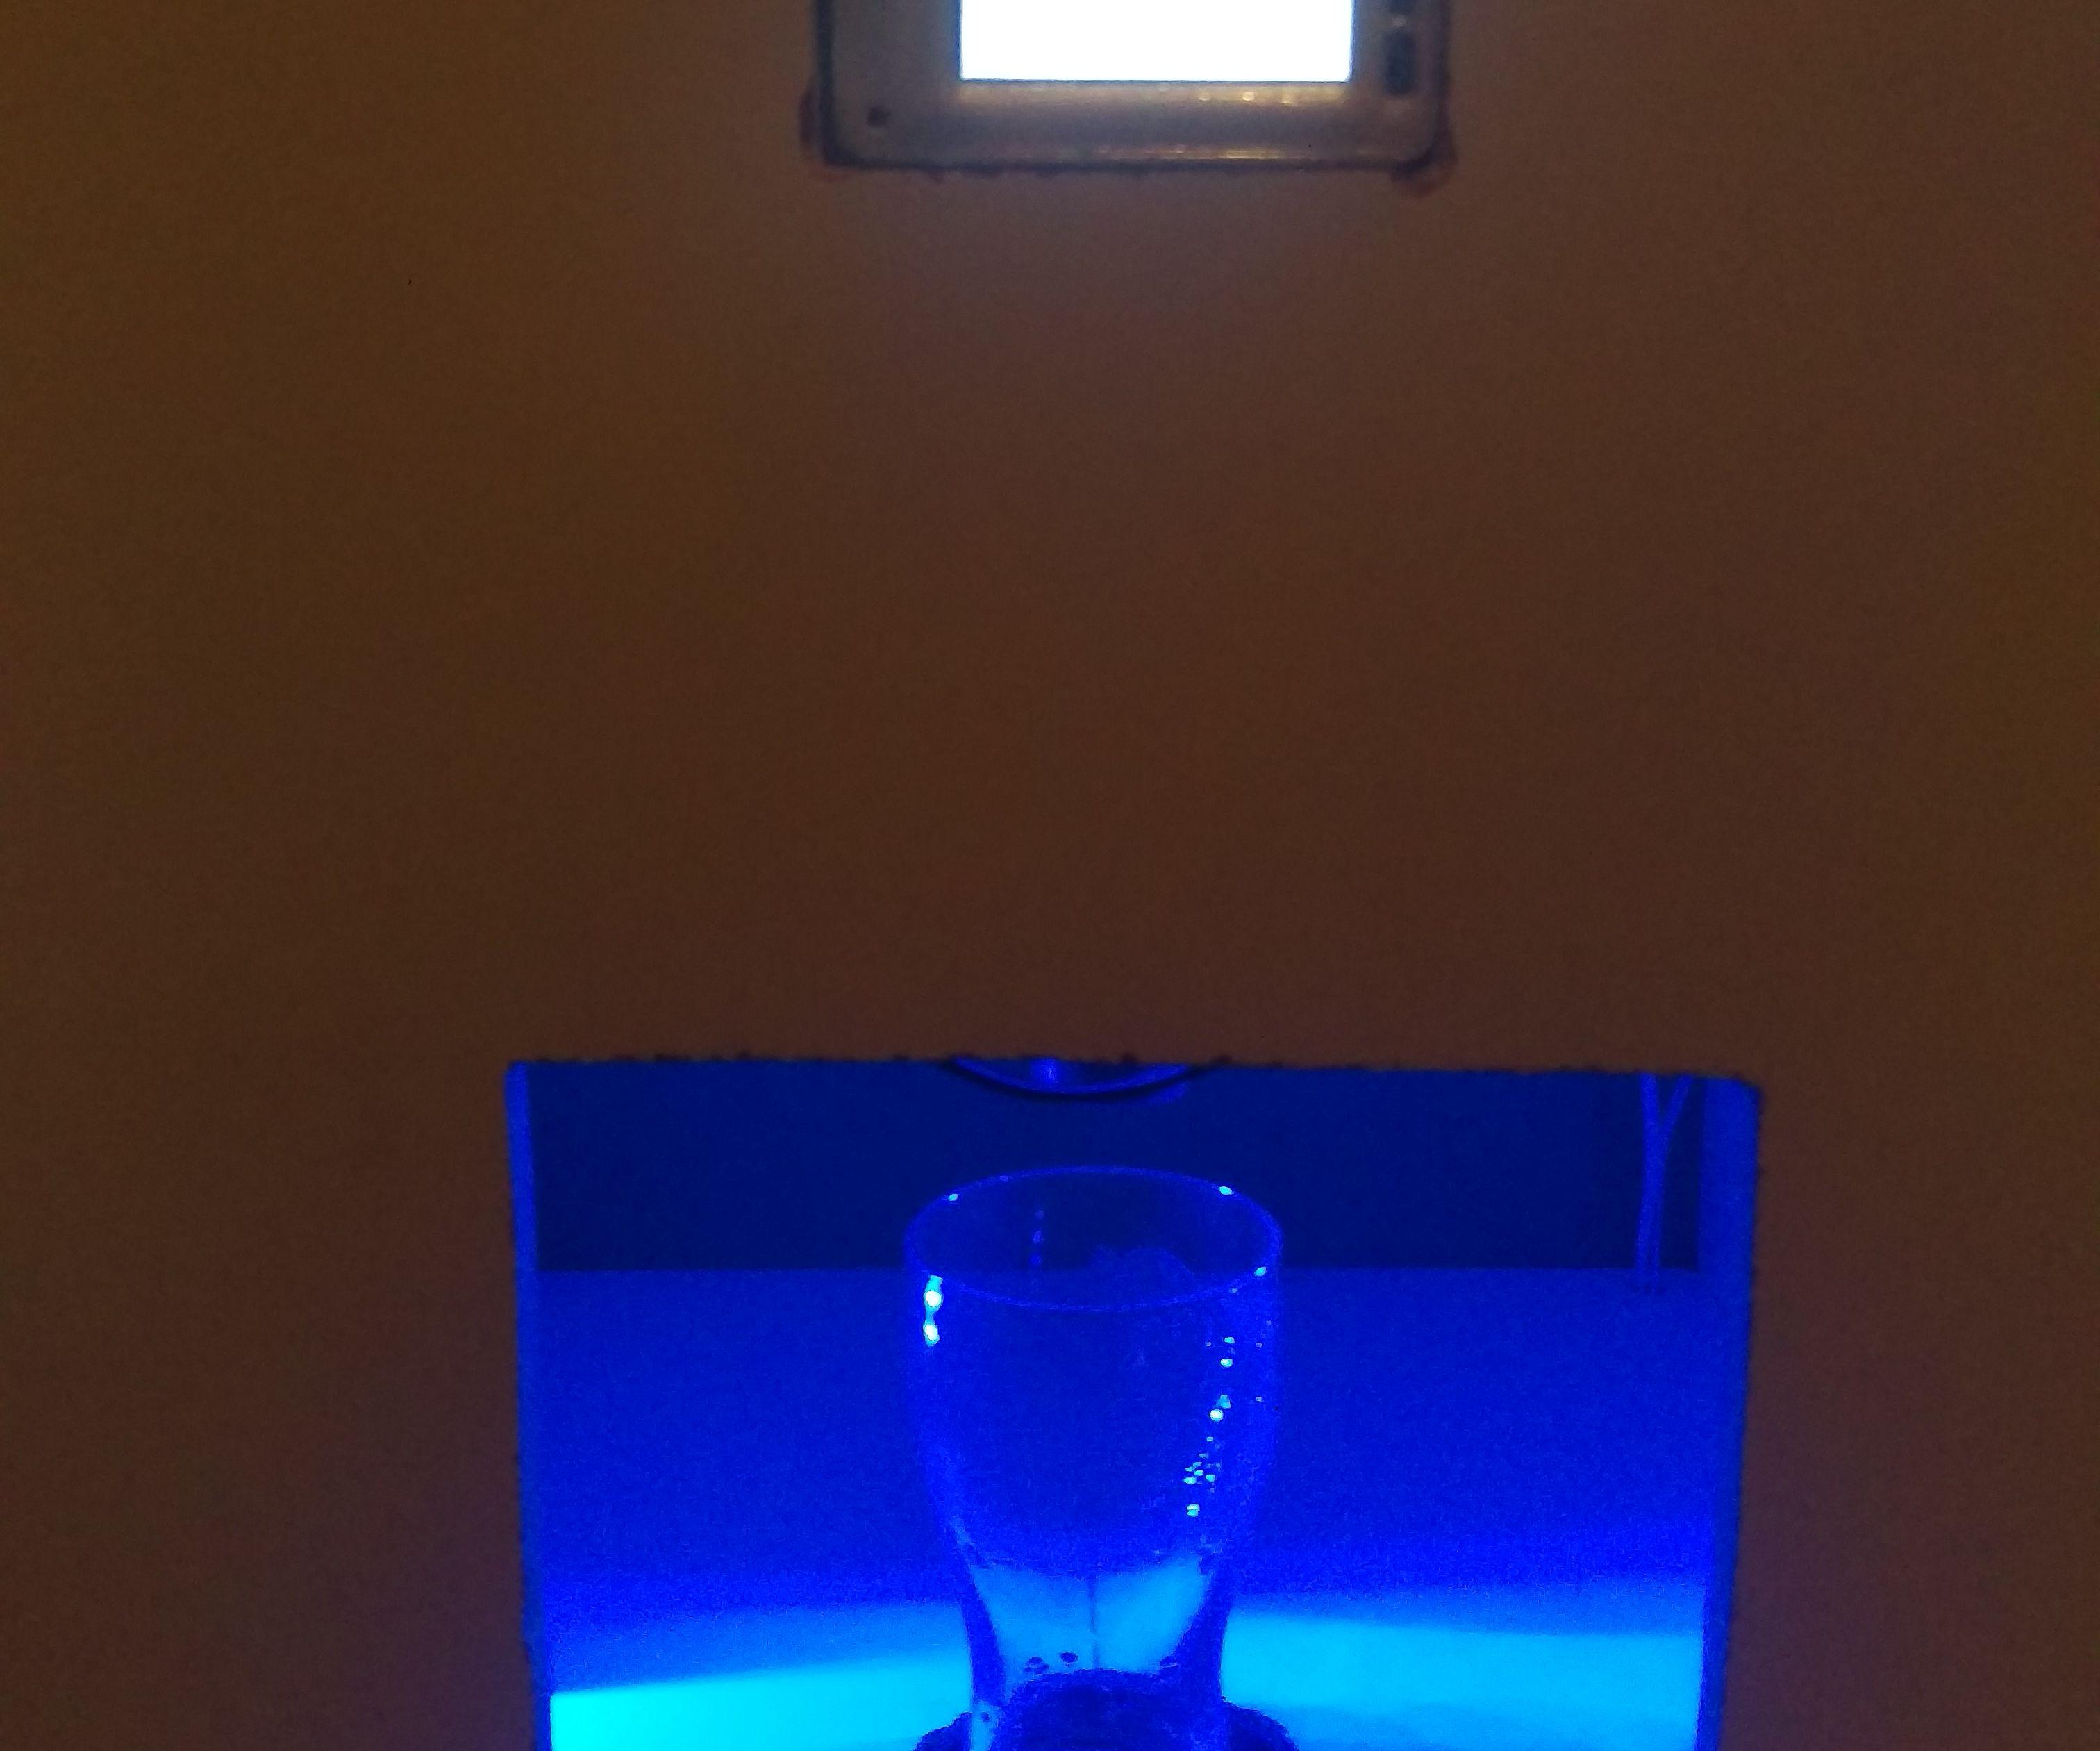 Cocktail machine with GUI Raspberry